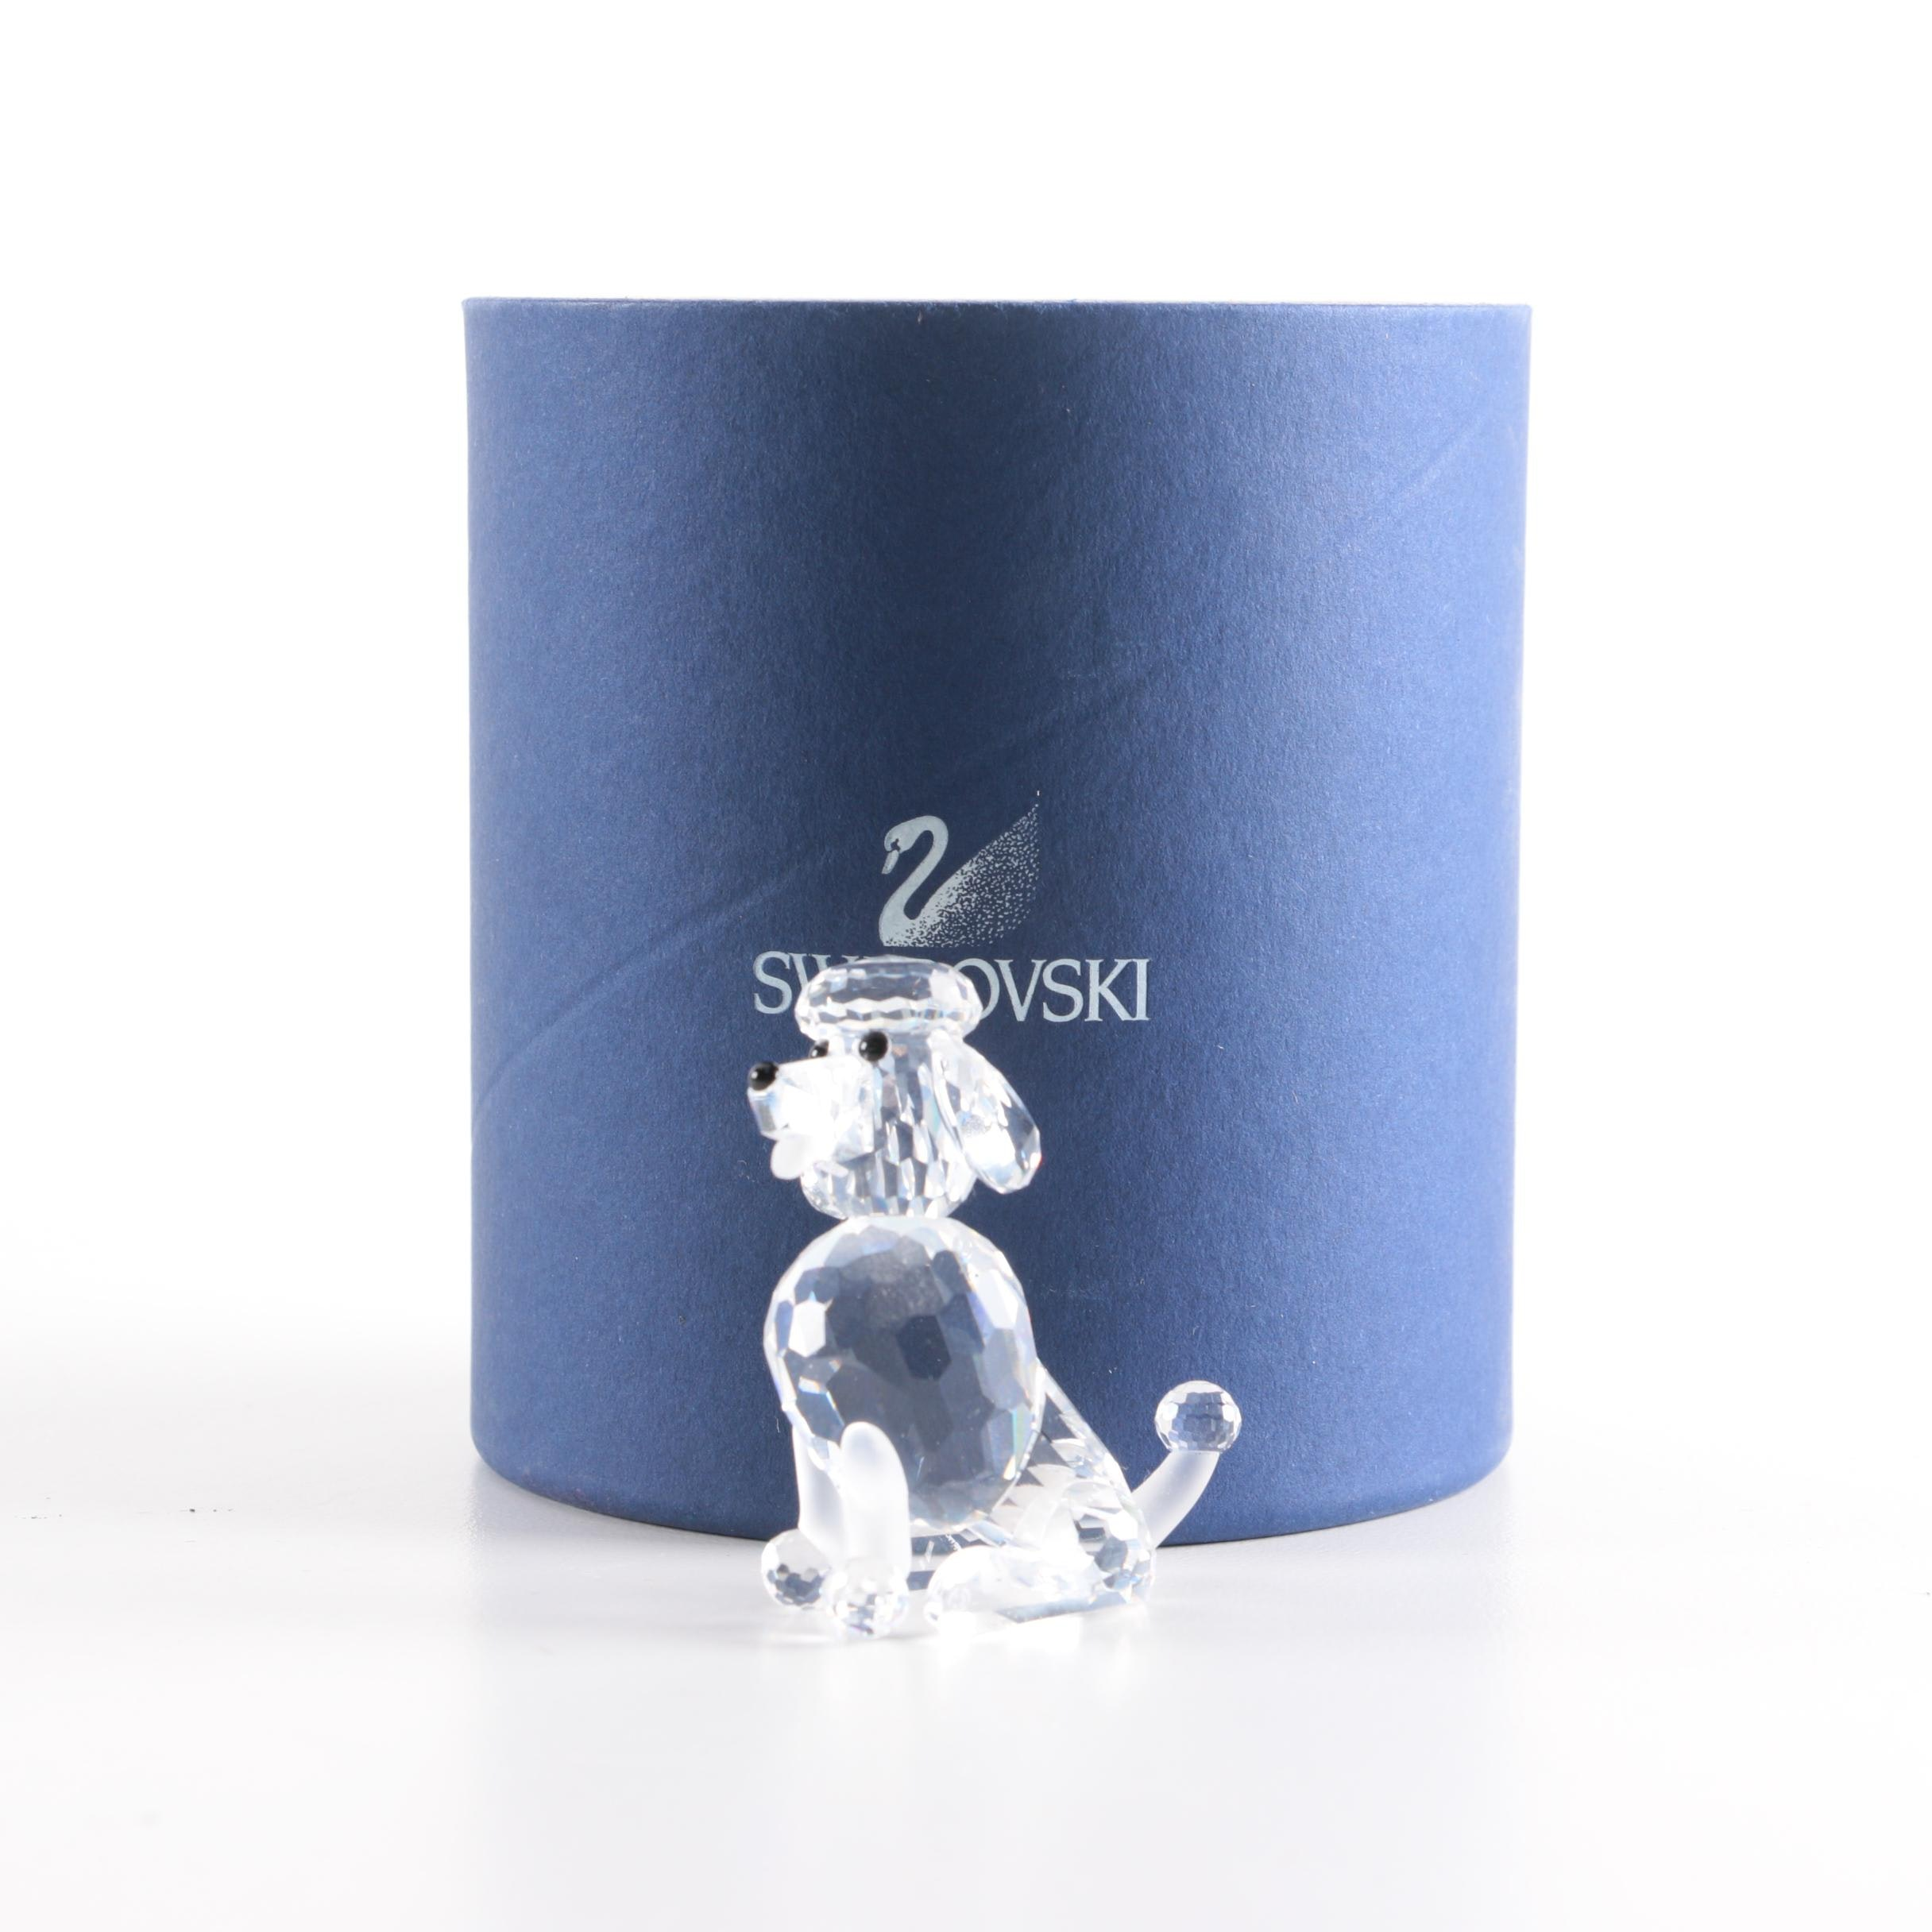 "2004 Swarovski Crystal ""Poodle Sitting"" Figurine"